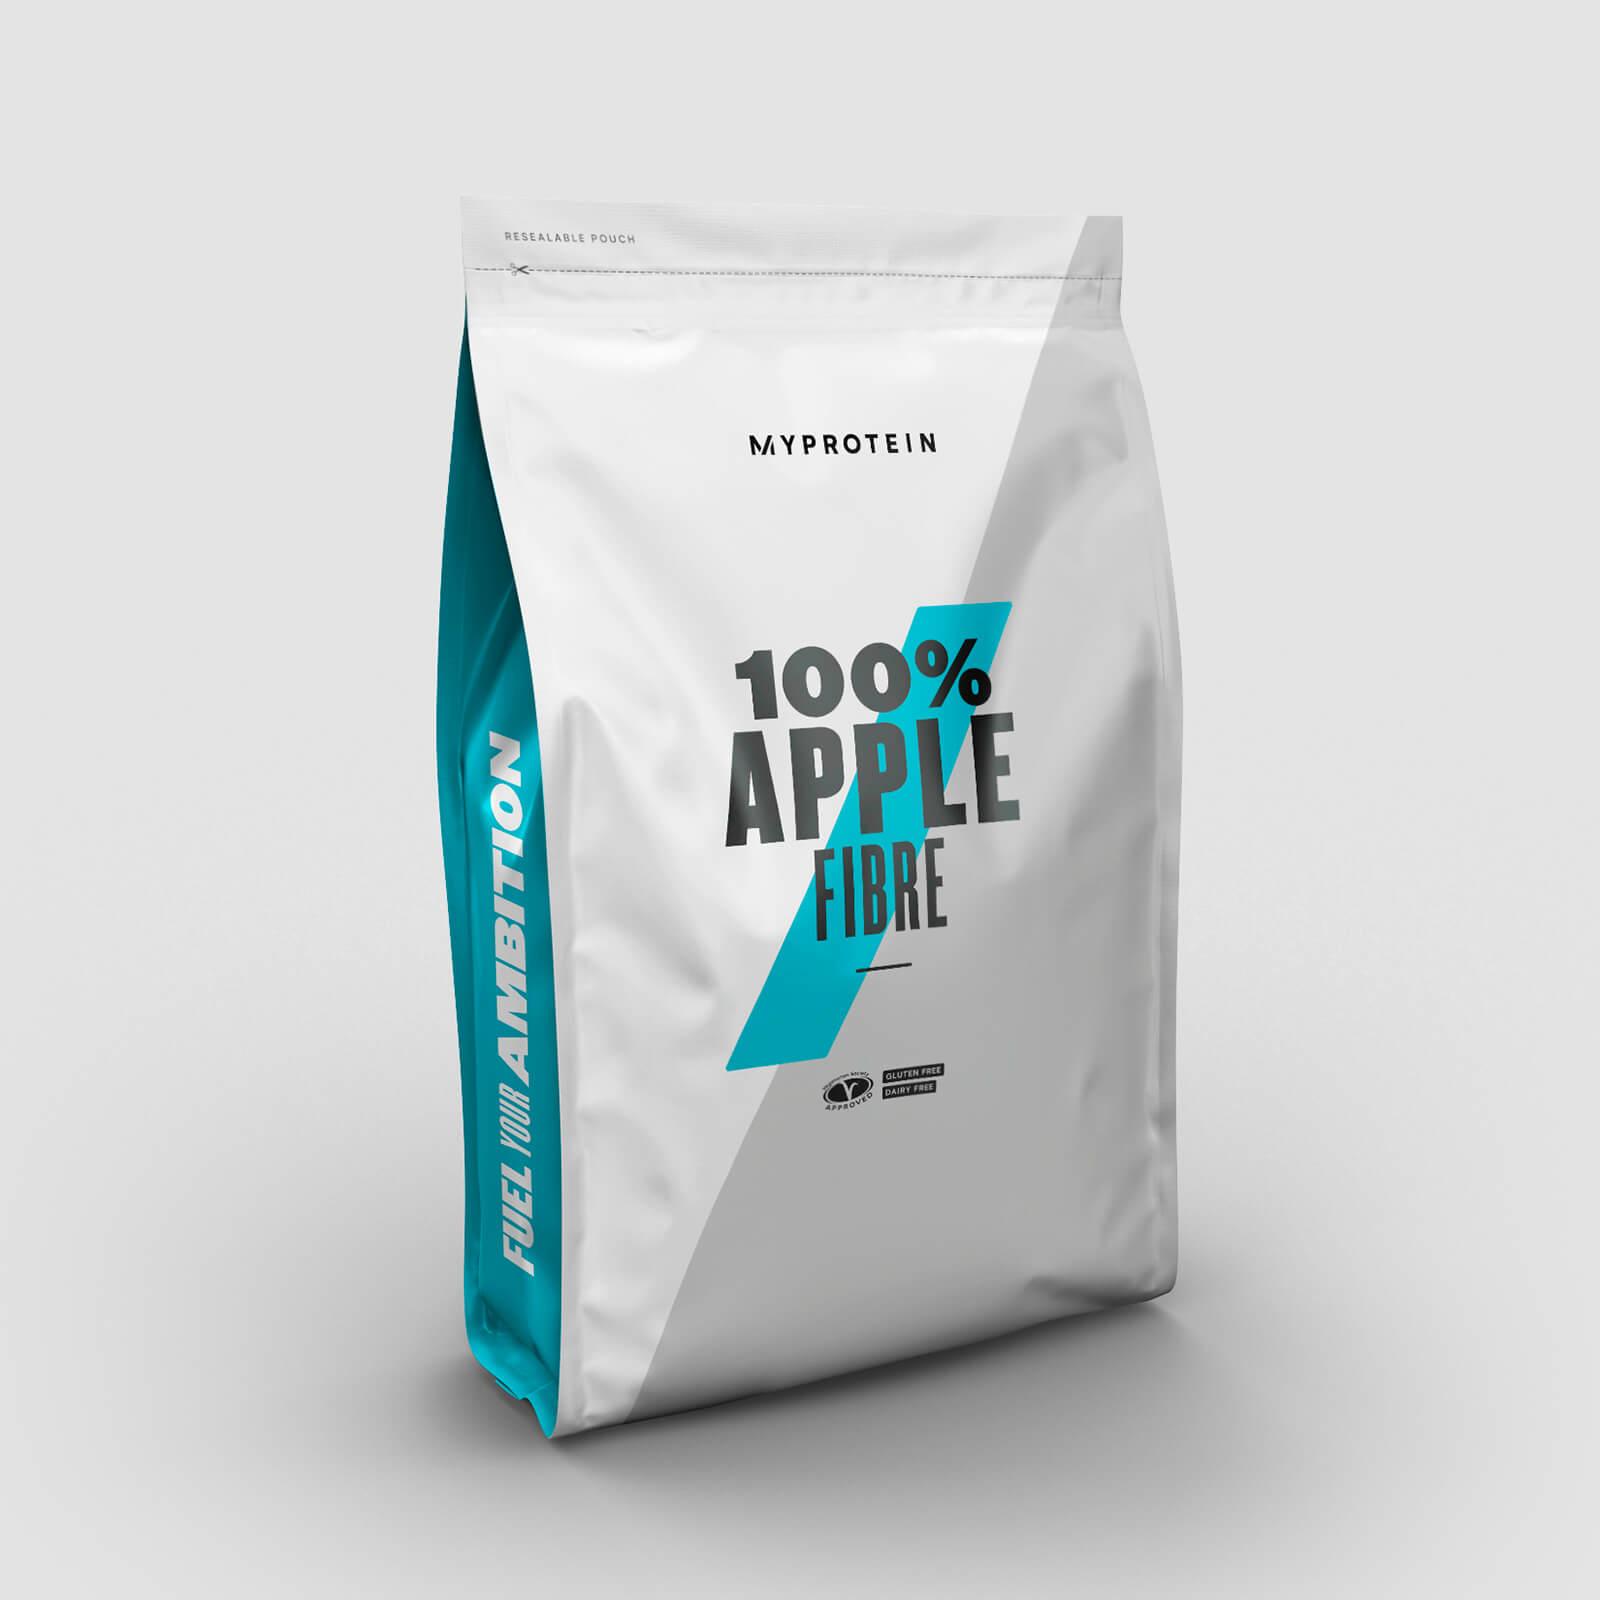 Best Apple Fibre Supplement